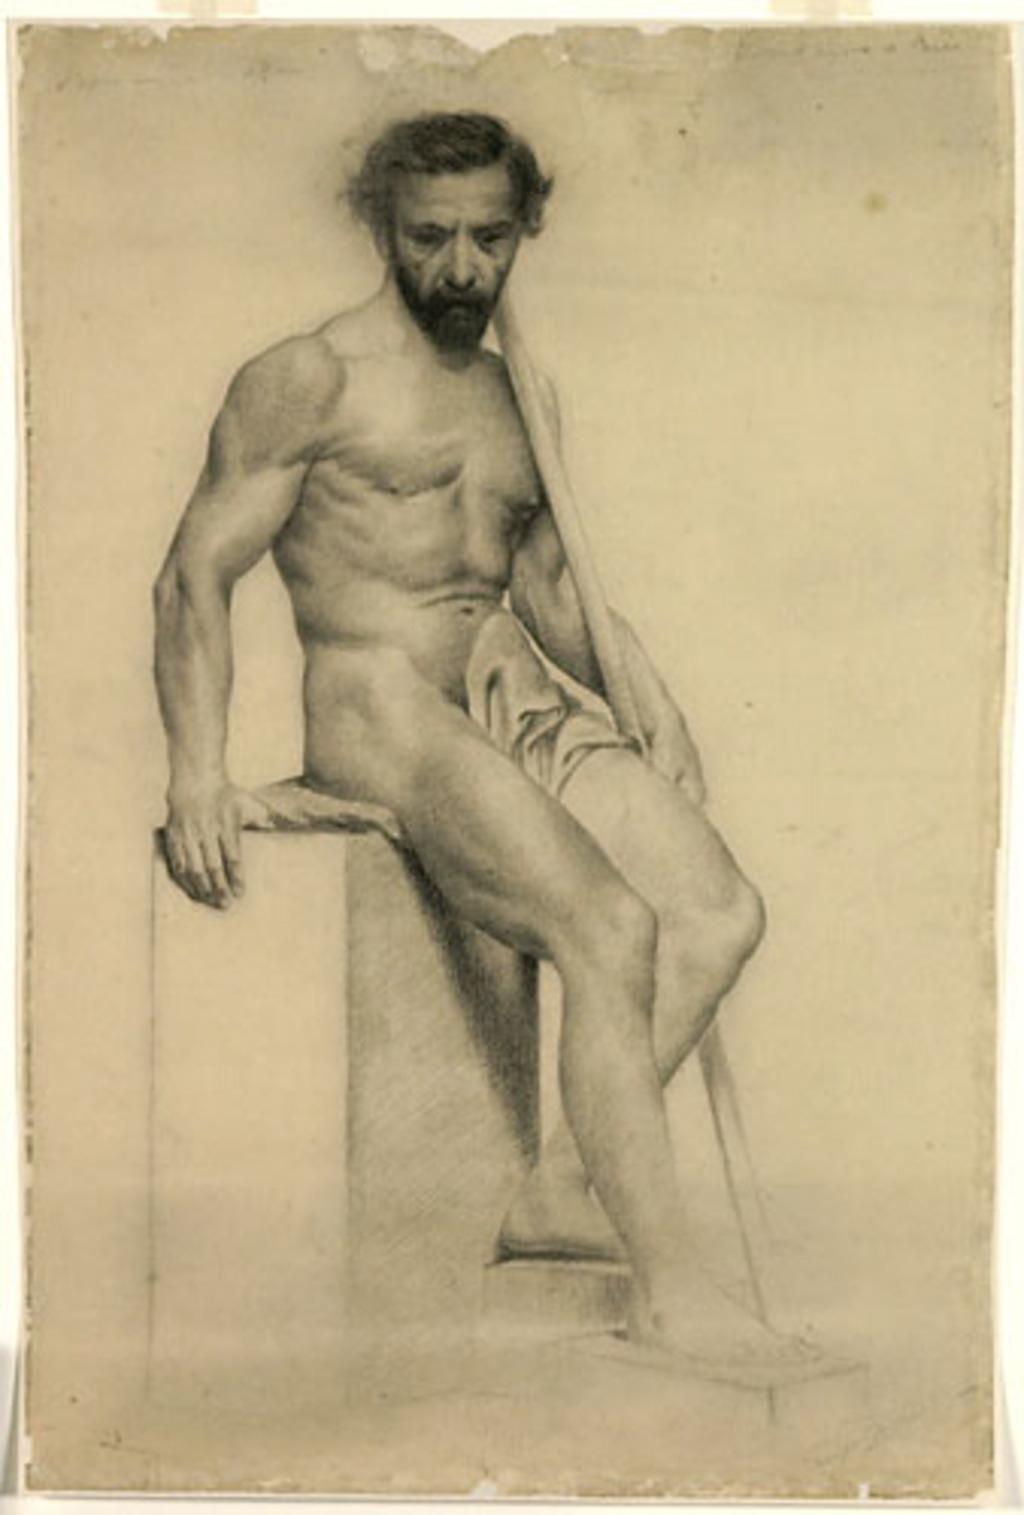 Nu masculin assis tenant un bâton